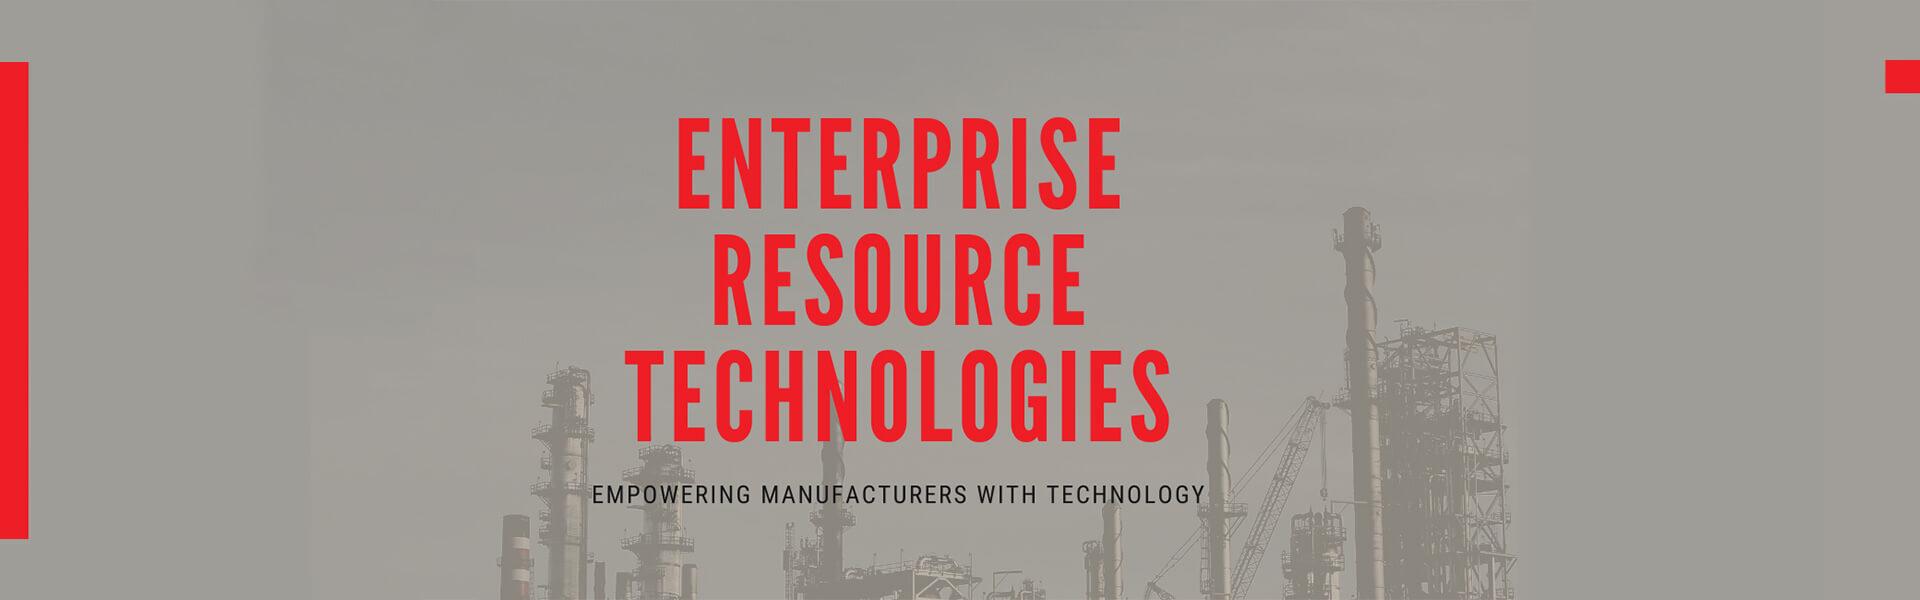 enterprise-slide1